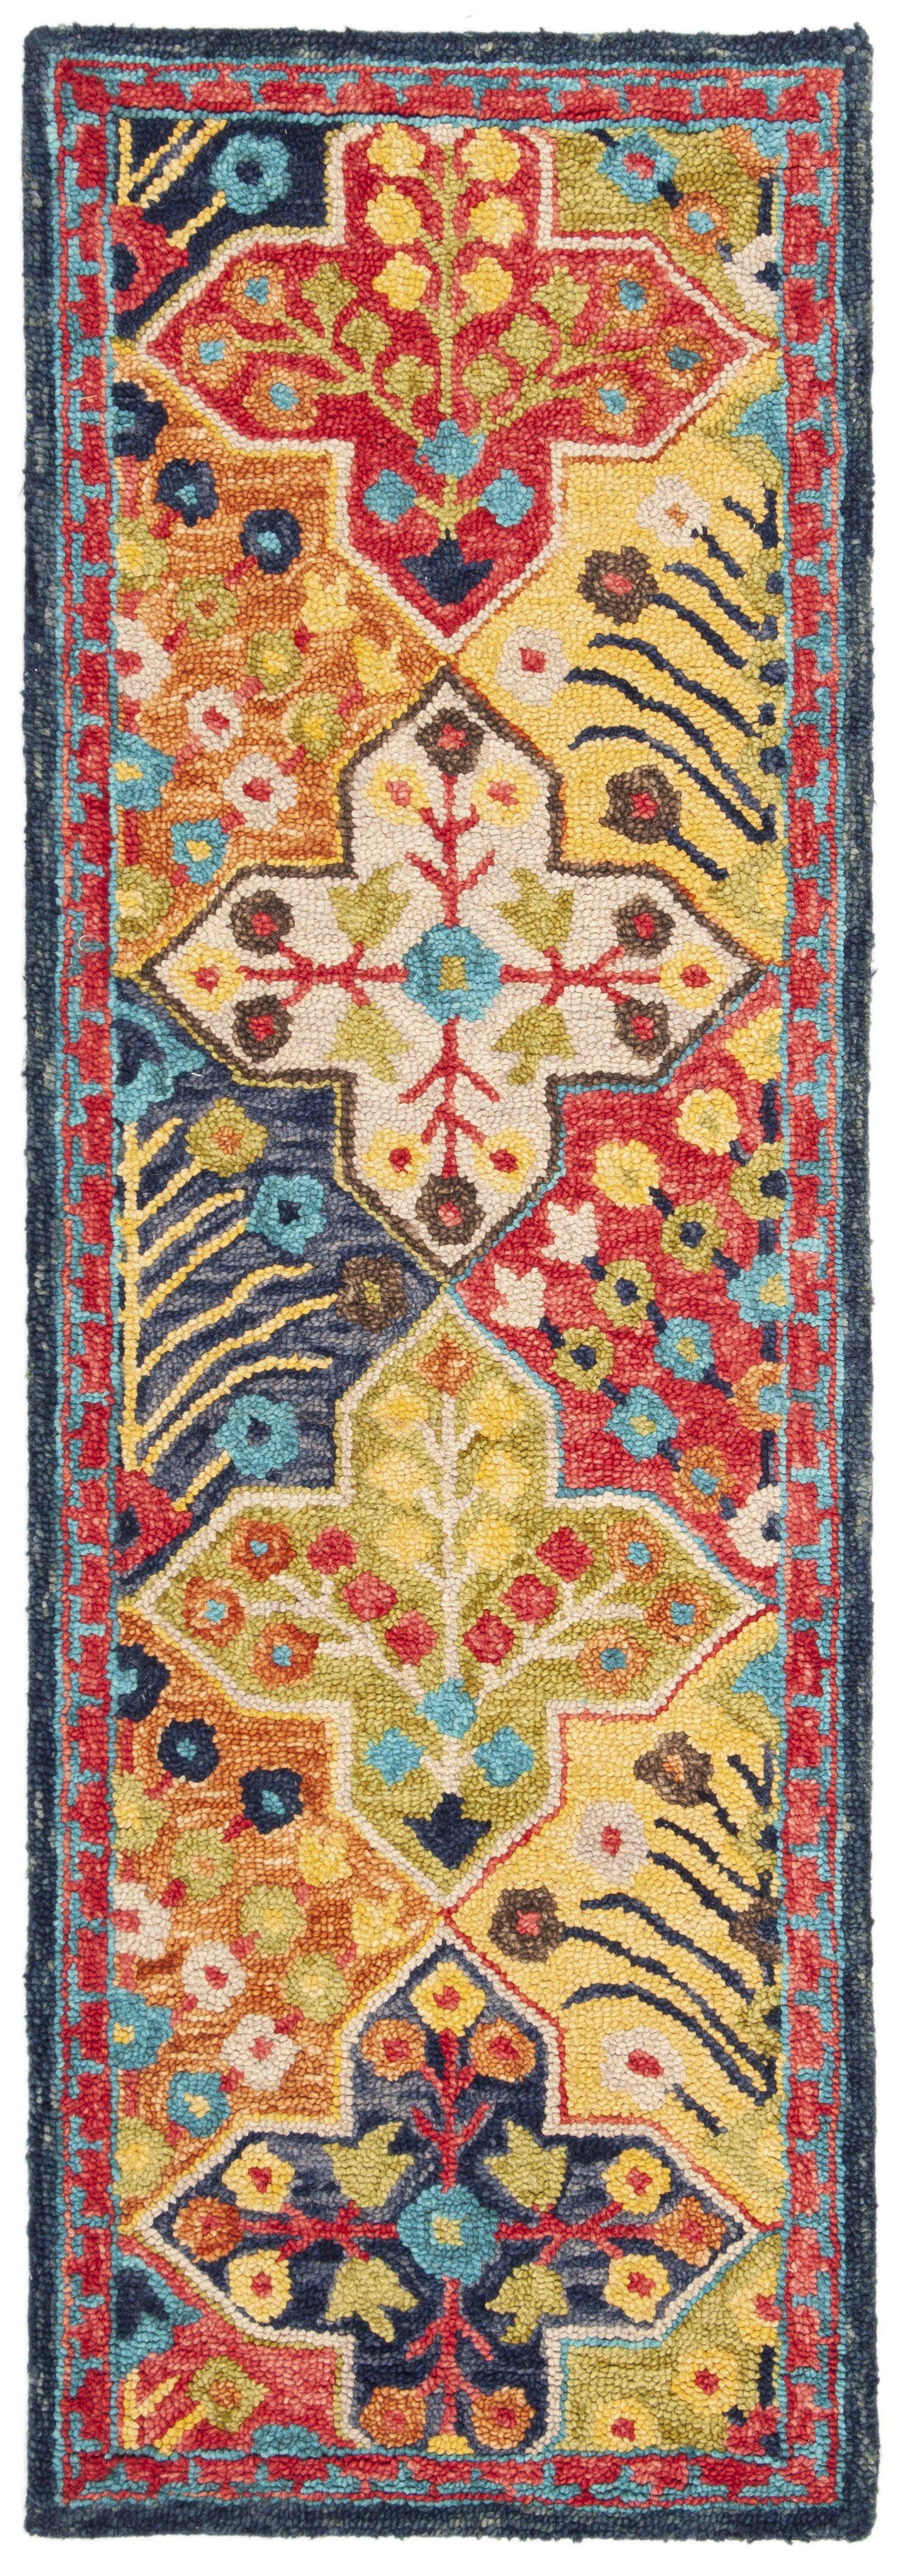 Poulin Hand-Tufted Wool Blue/Orange Area Rug Rug Size: Runner 2'3